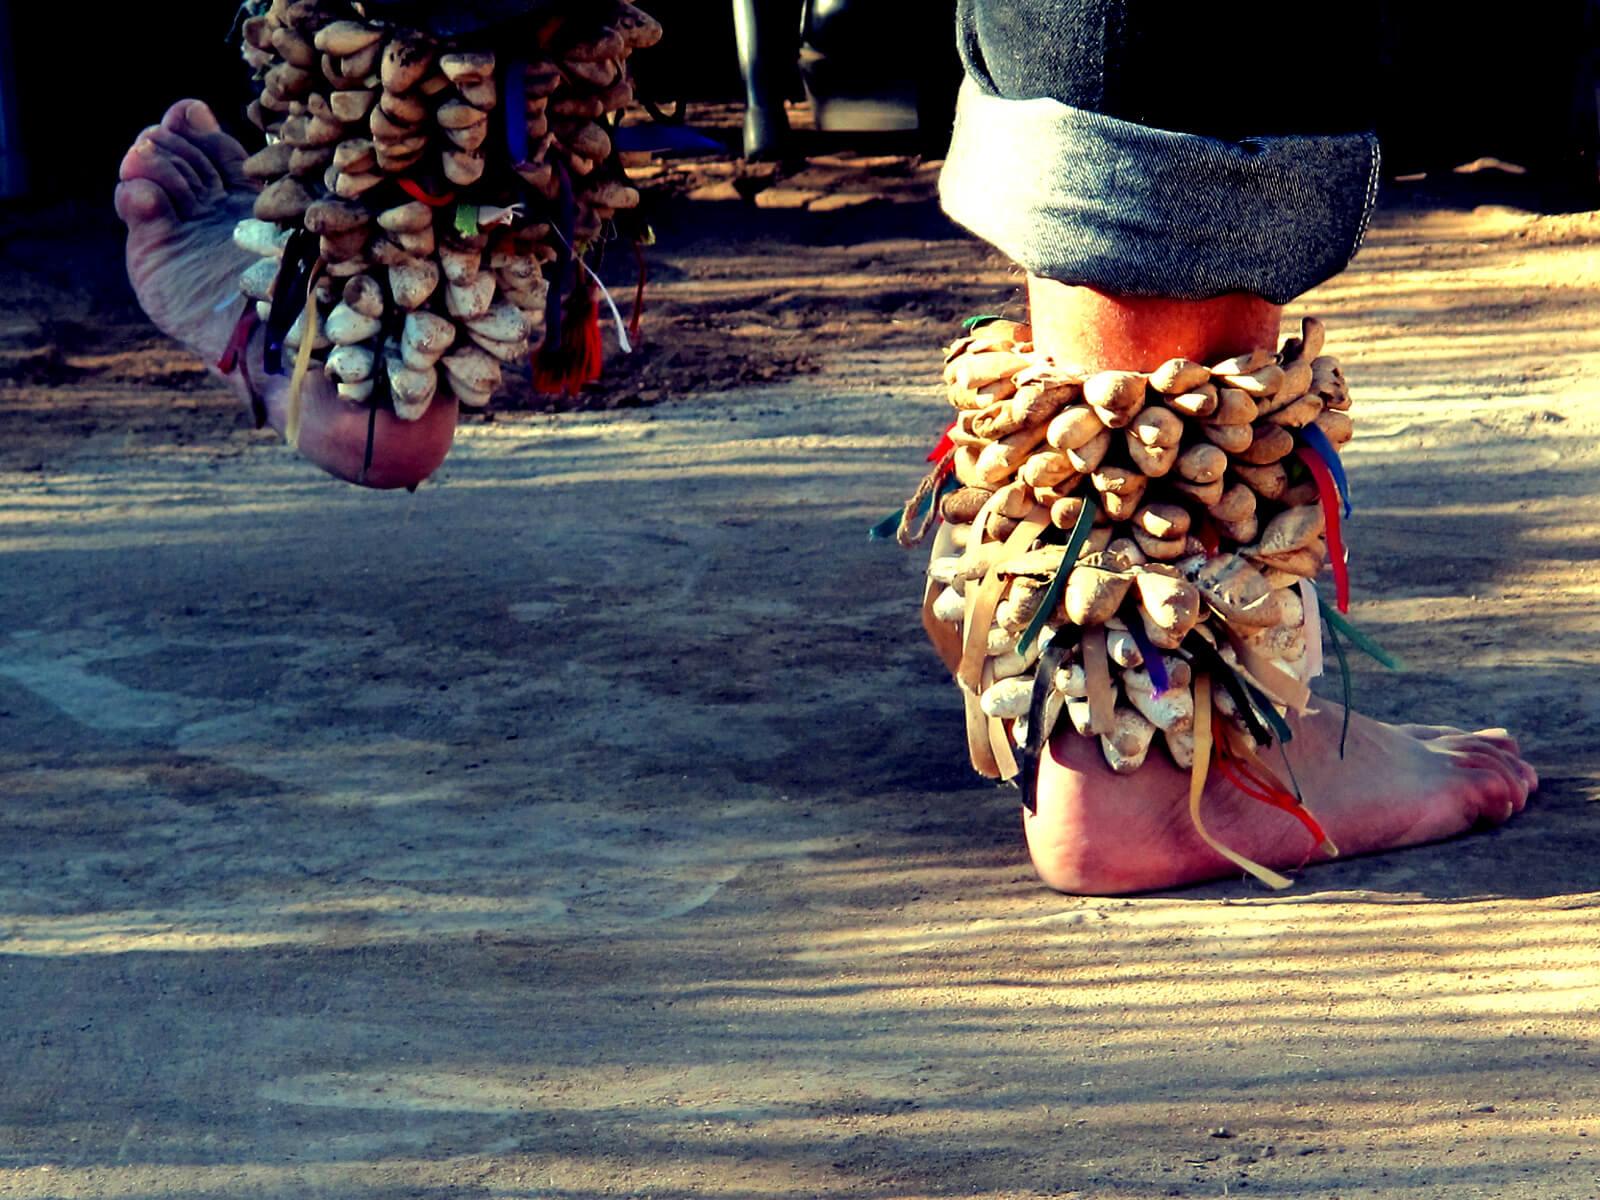 Walking The Balance